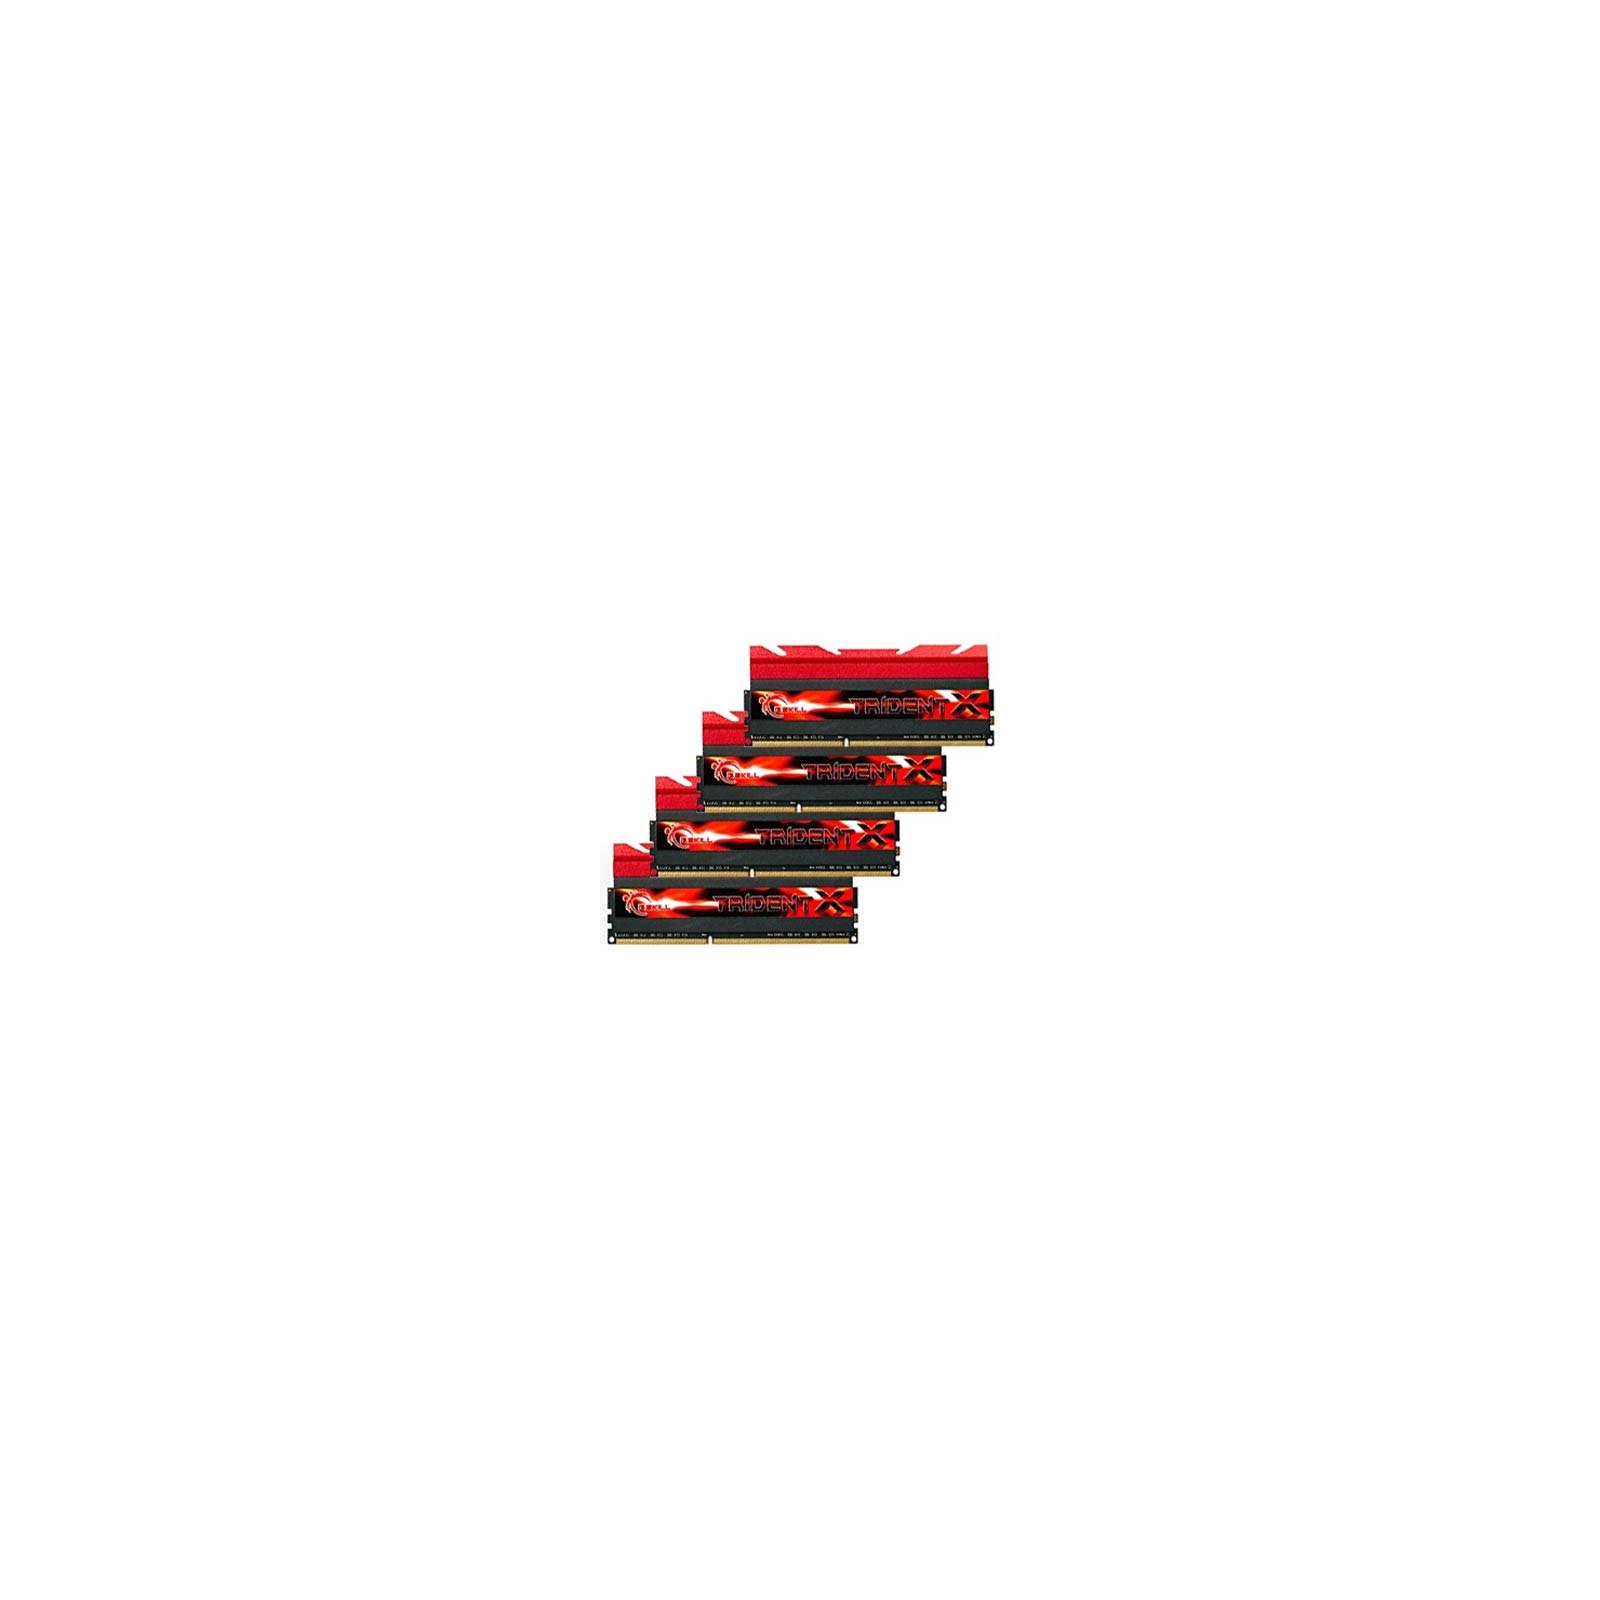 Модуль памяти для компьютера DDR3 32GB (4x8GB) 2400 MHz G.Skill (F3-2400C10Q-32GTX)